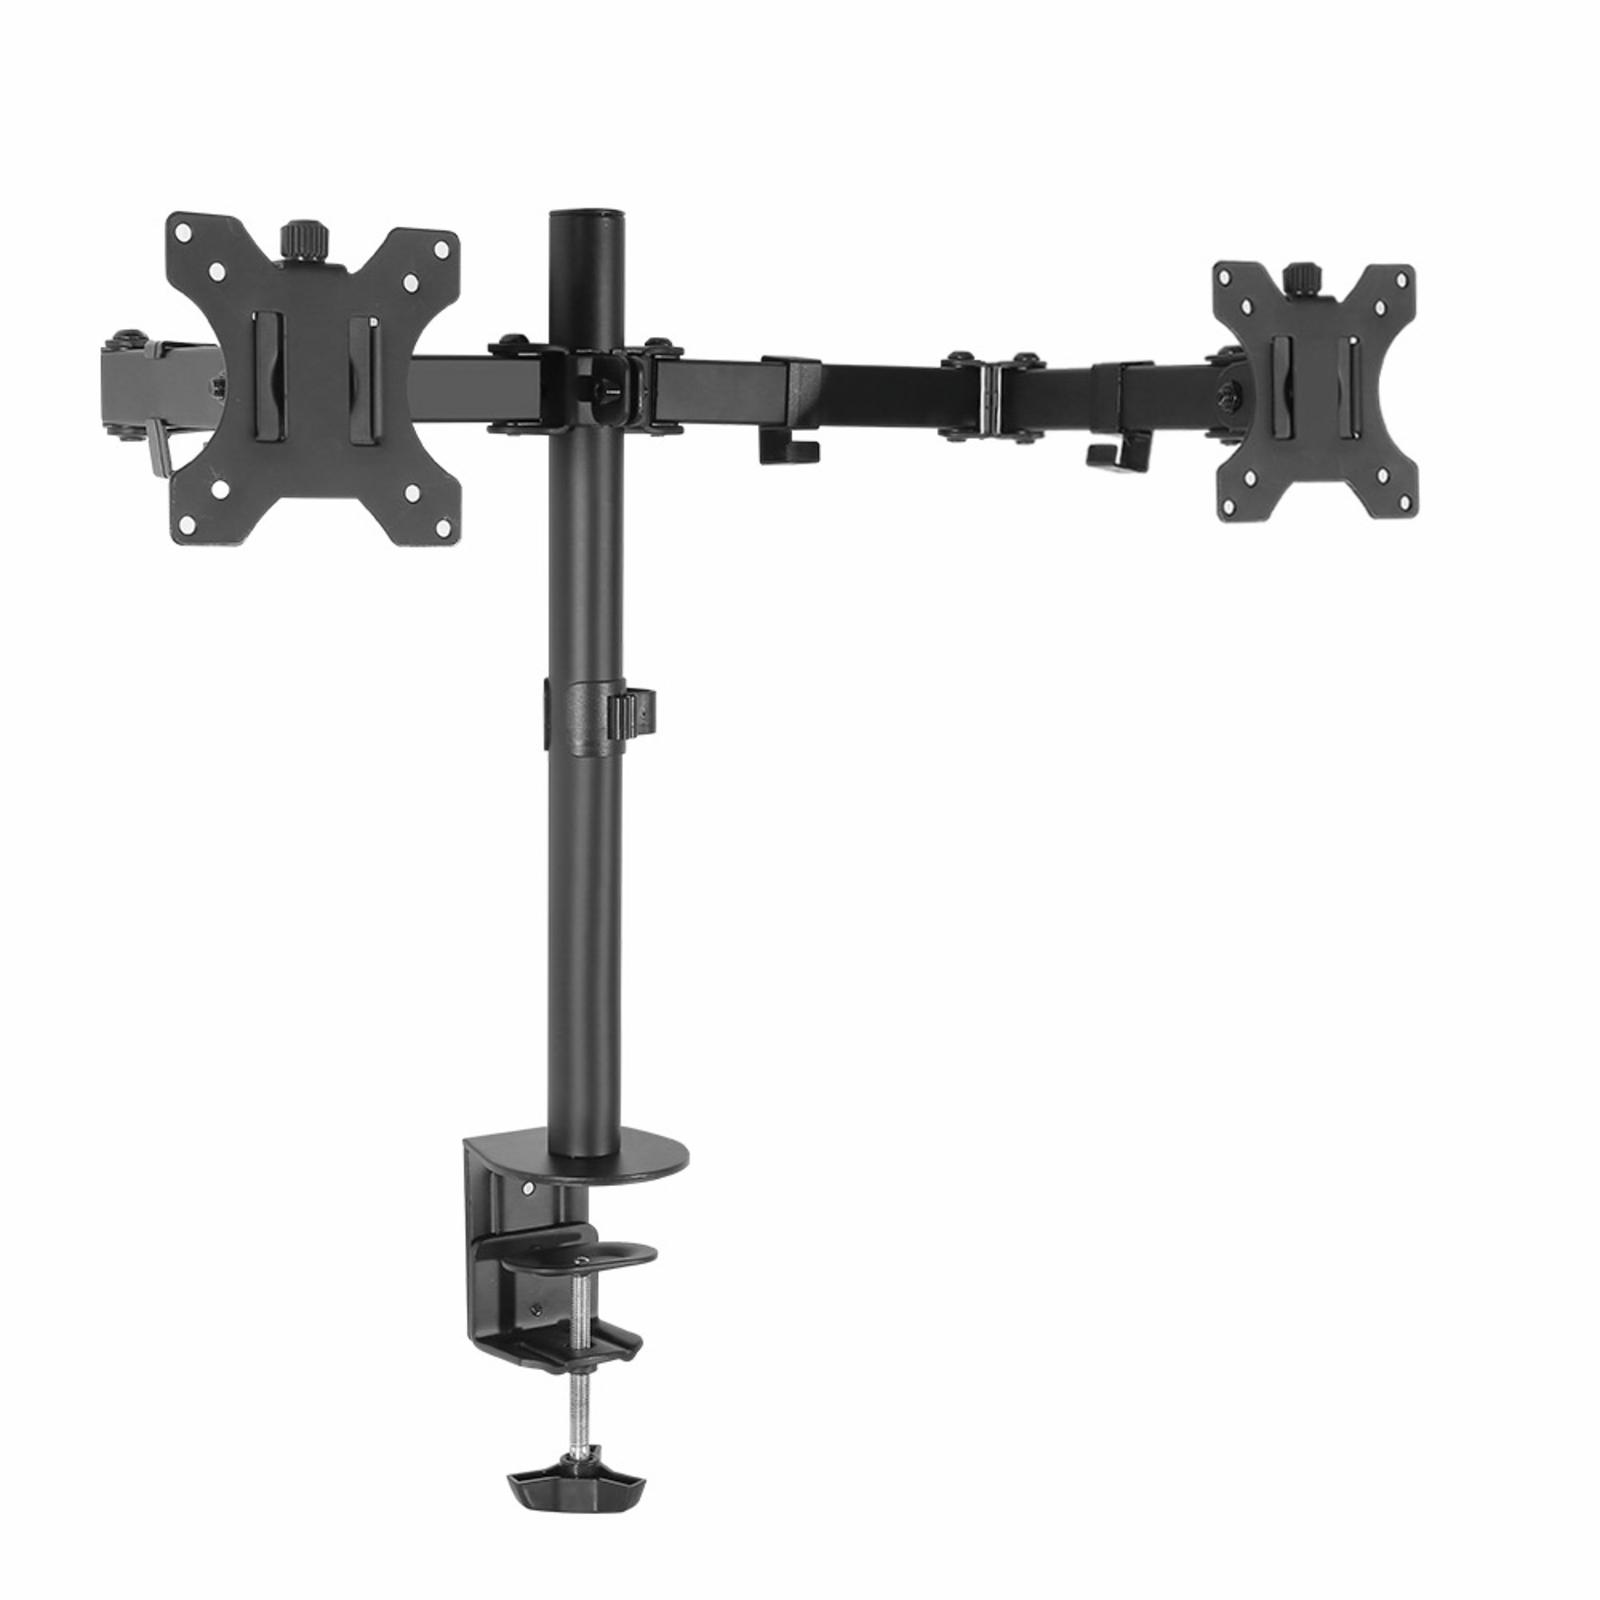 Artiss Dual Monitor Arm Stand 2 Desk Mount HD LED LCD Screen TV Holder Bracket